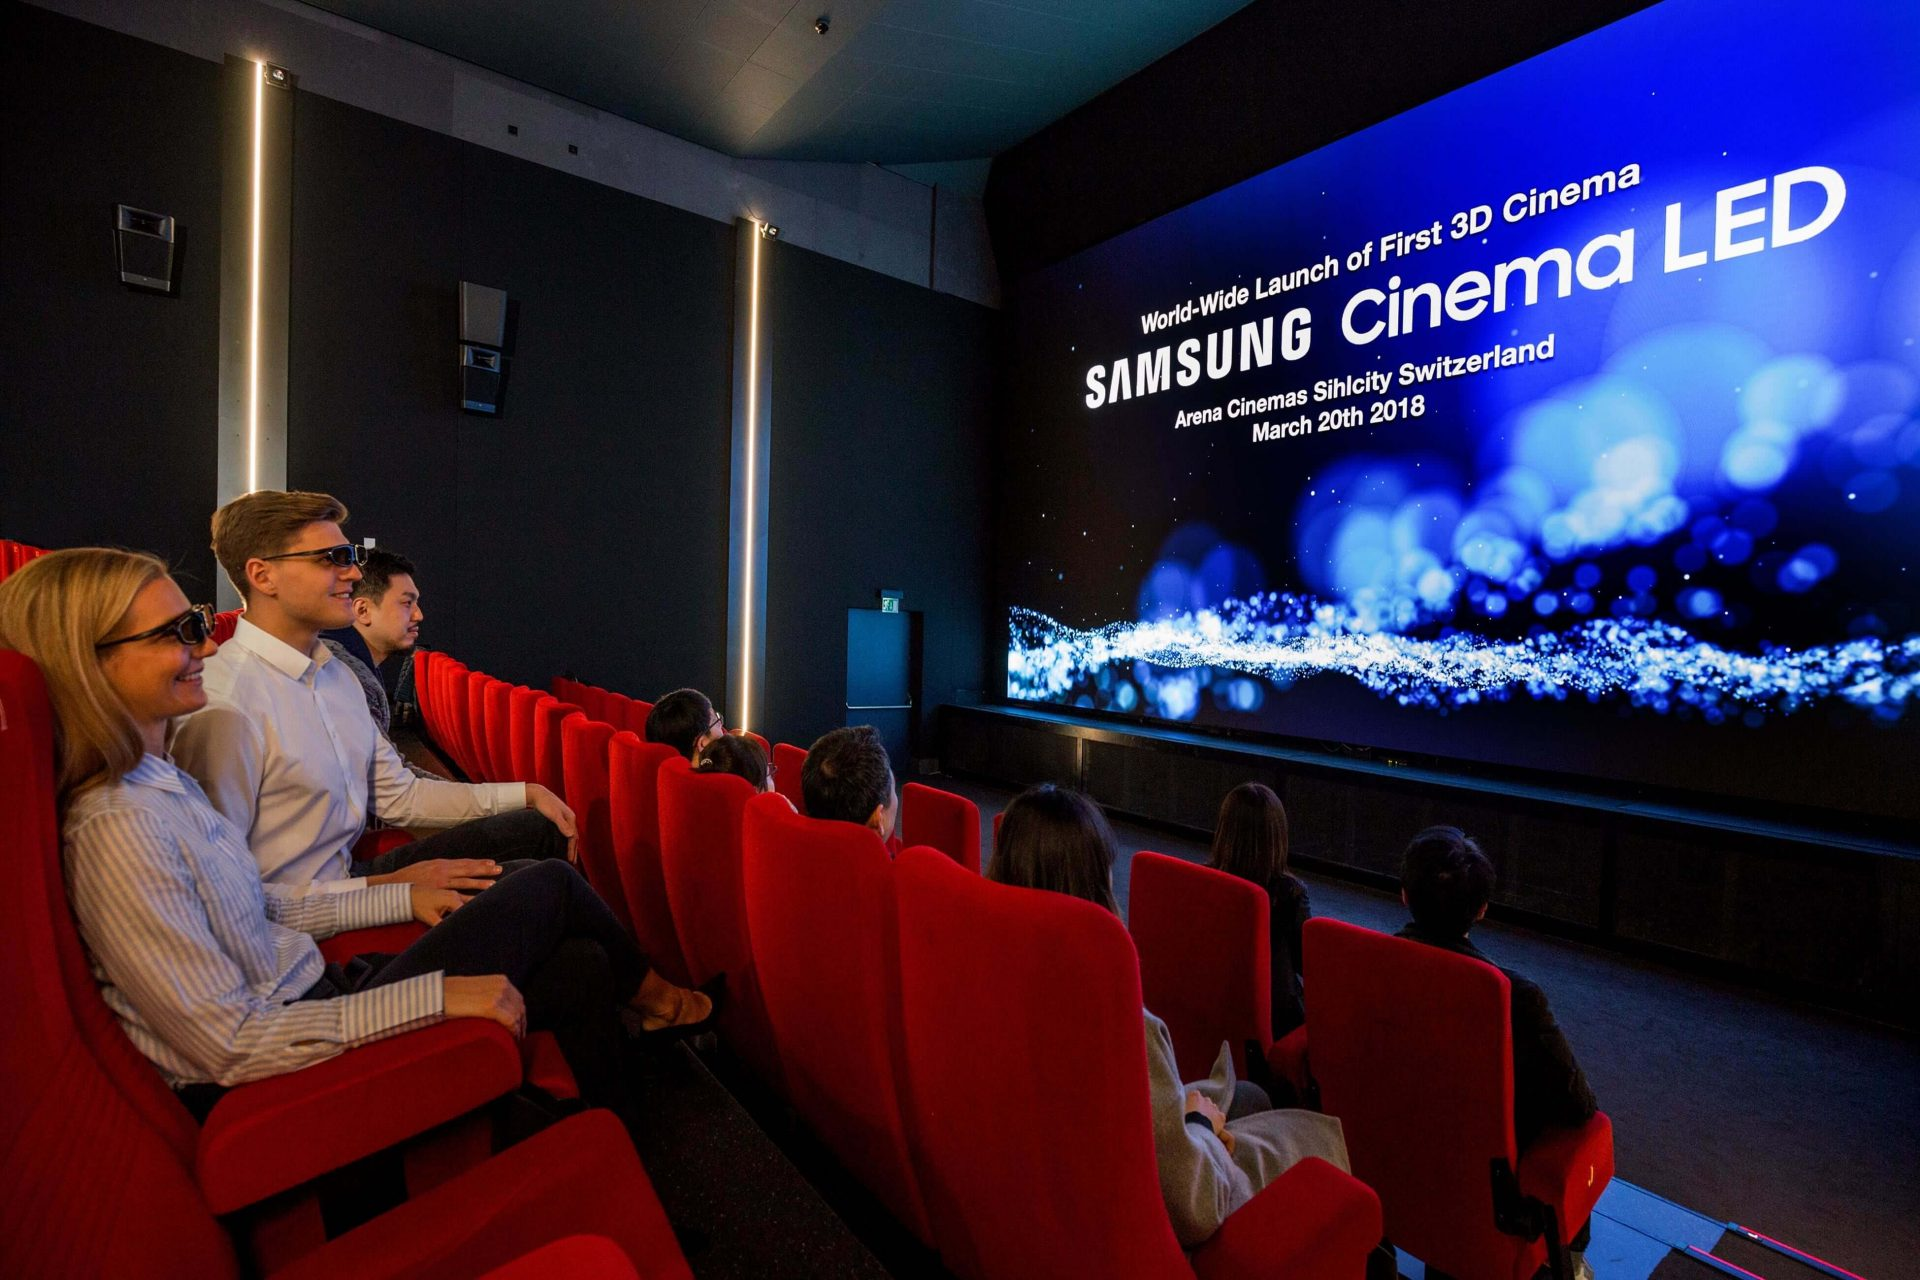 samsung 3d cinema led 2 - Samsung Onyx: primeira tela LED de cinema chega ao Brasil